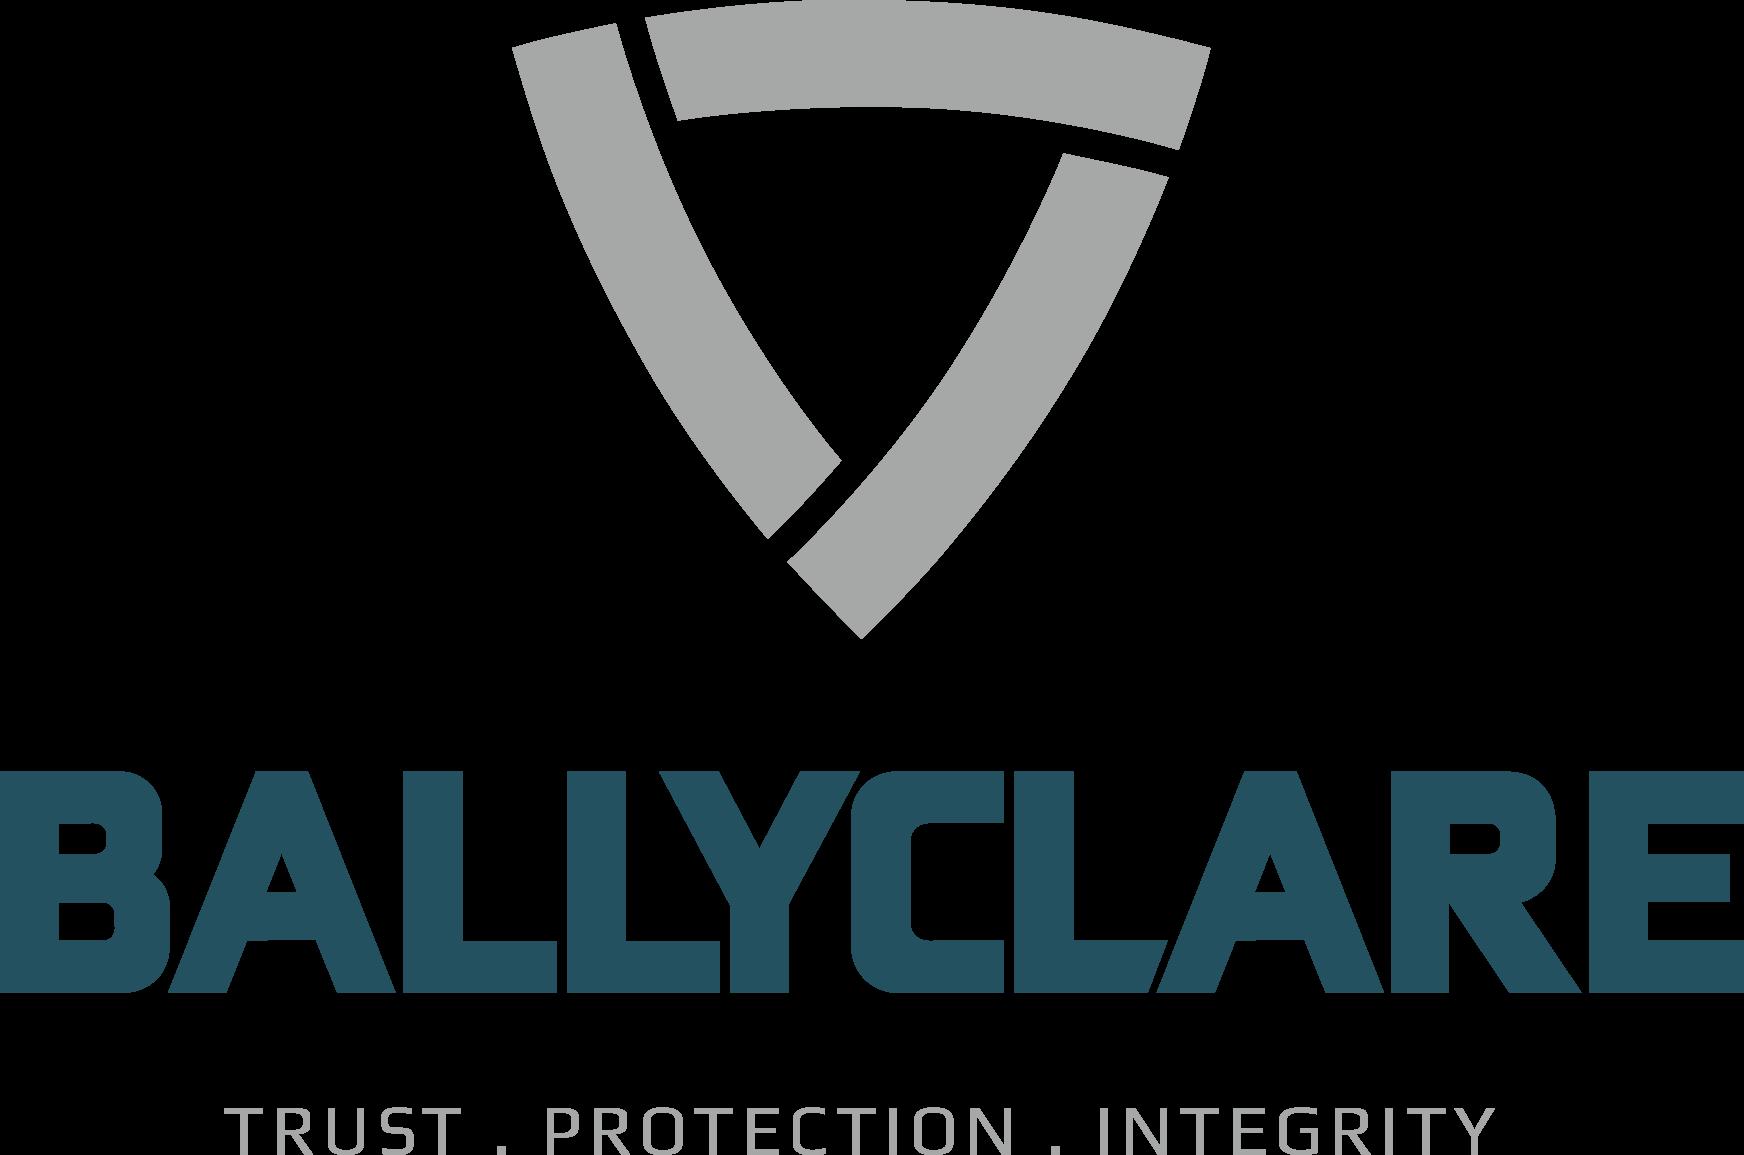 Ballyclare2